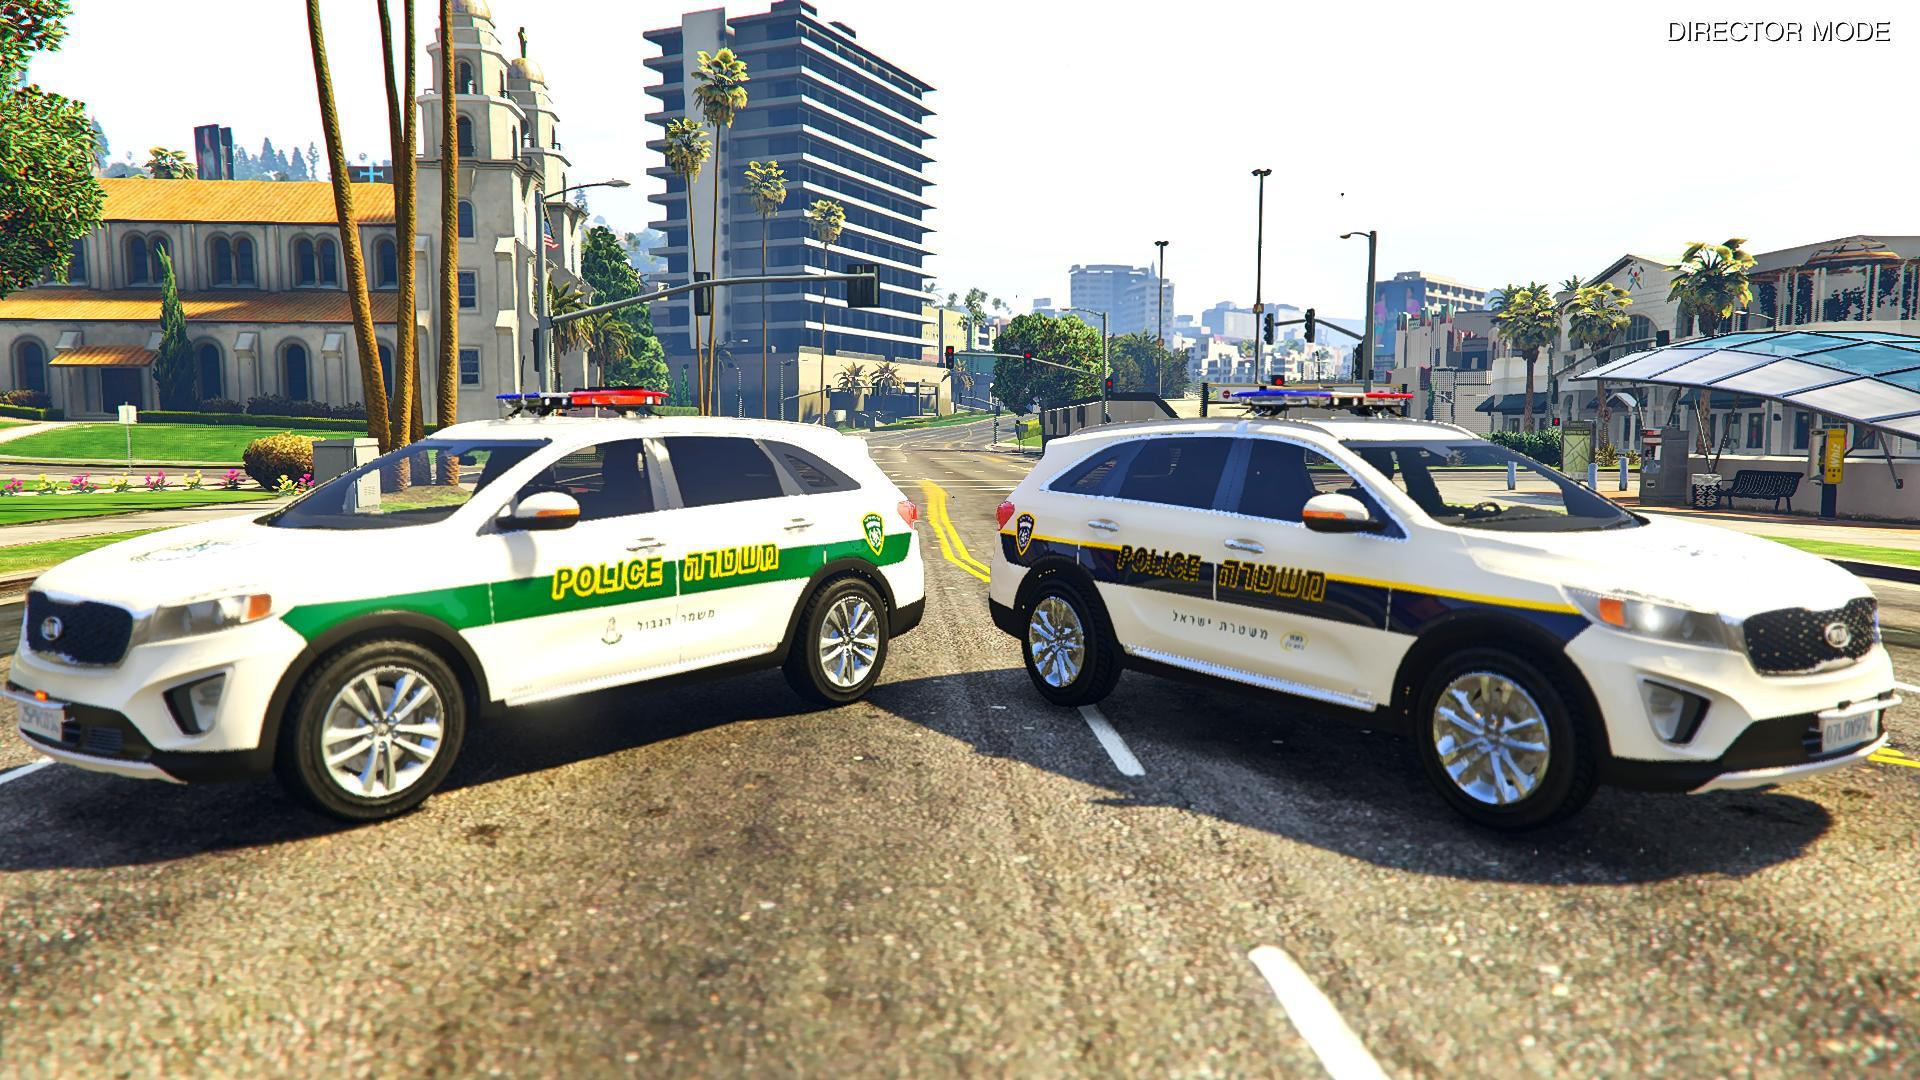 gta 5 director mode police